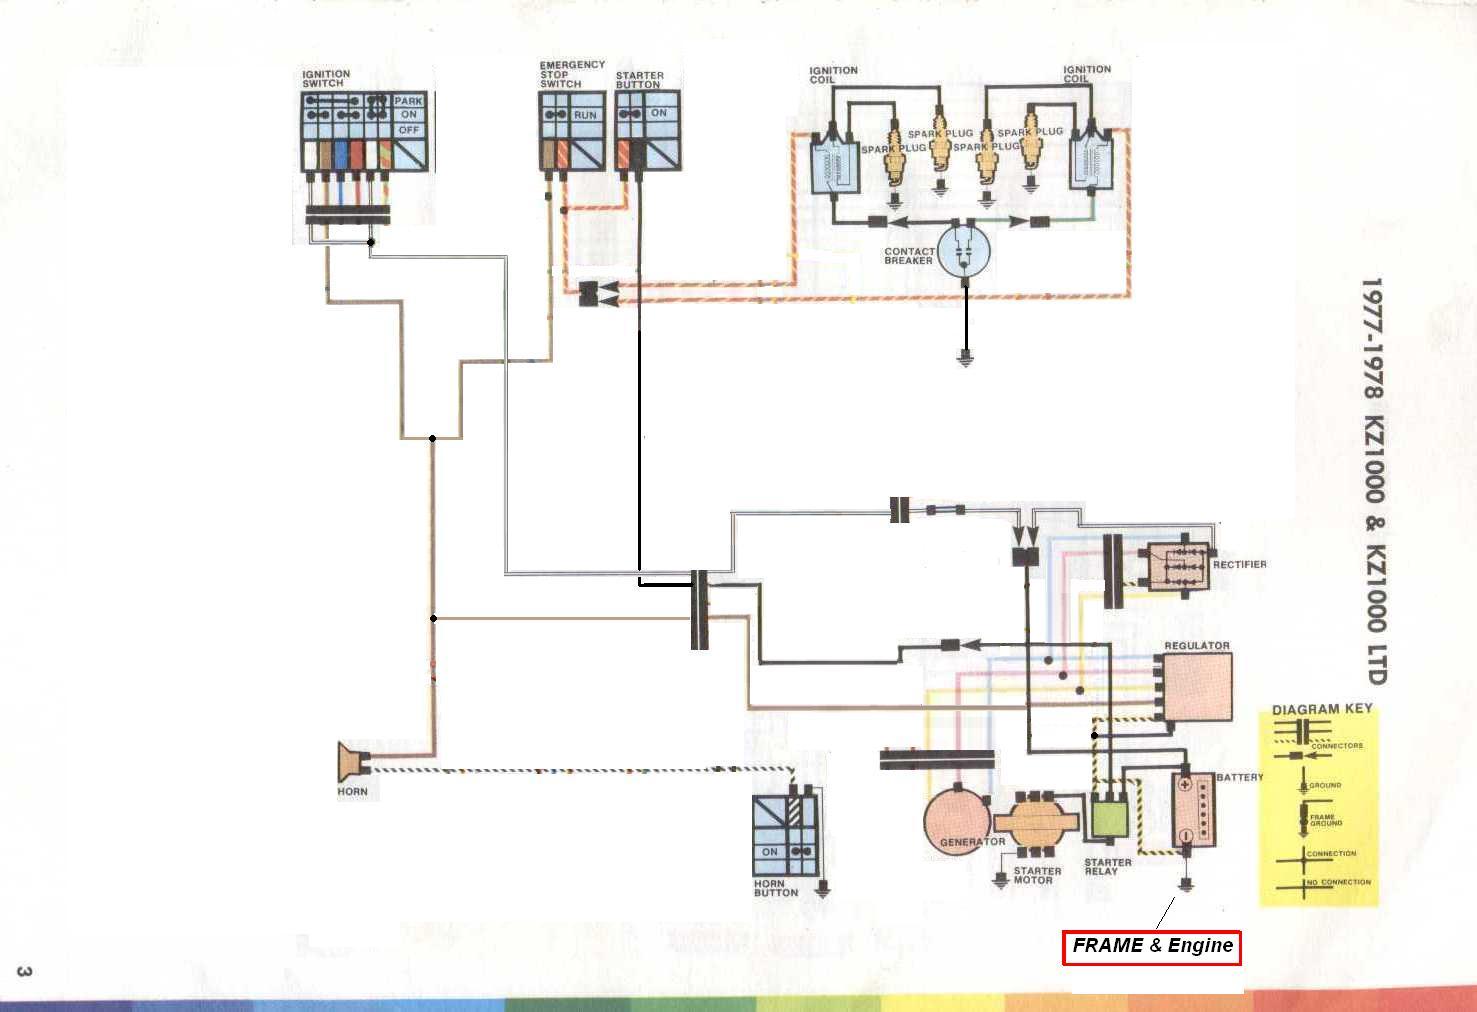 1979 kawasaki kz1000 wiring diagram